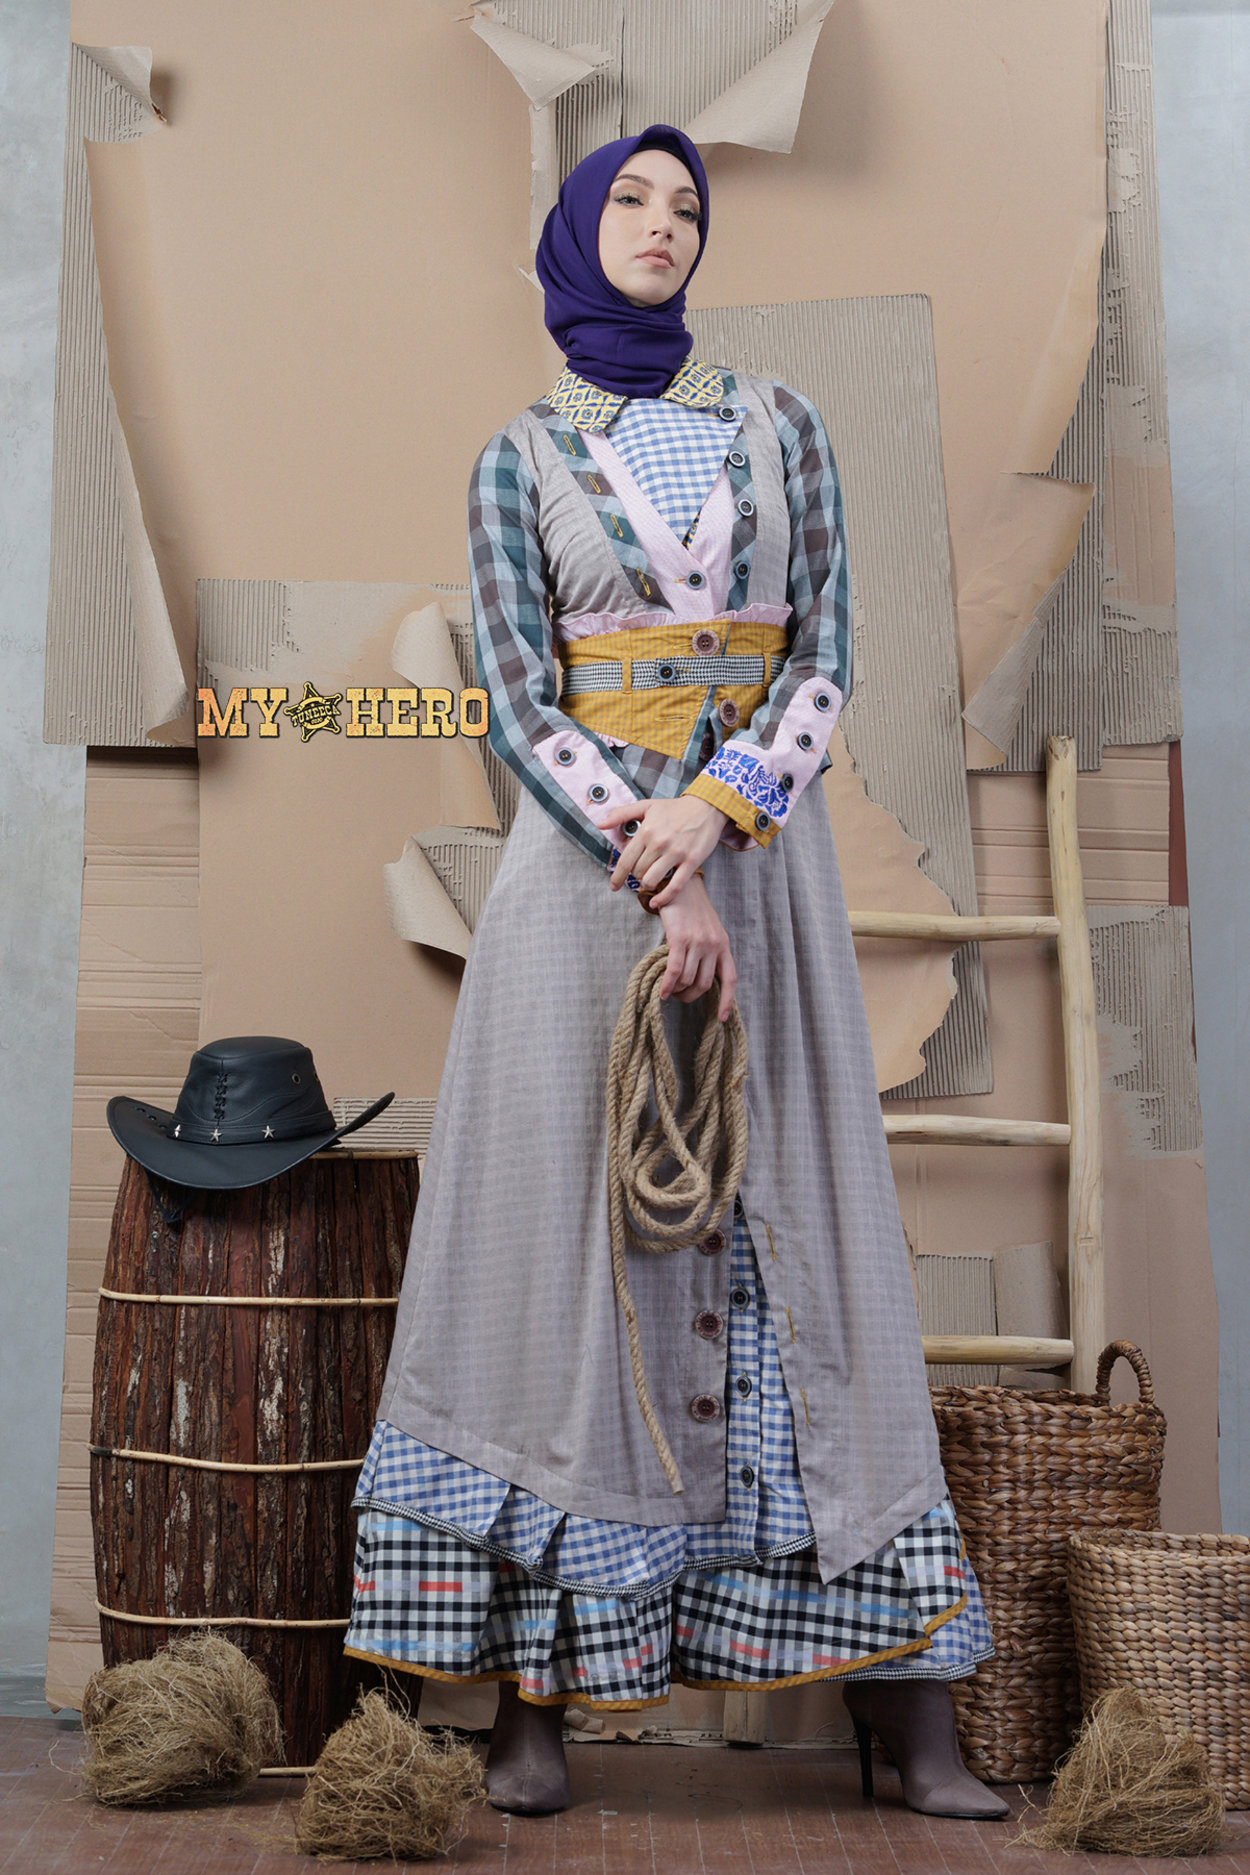 Around The Railhead Butik Sasmaya Wa 0857 2720 6282 0821 3831 9990 Hijab Fashion Store Busana Muslim Online Toko Baju Muslim Online Grosir Baju Muslim Hijab Tuneeca Sale Butiksasmaya Com